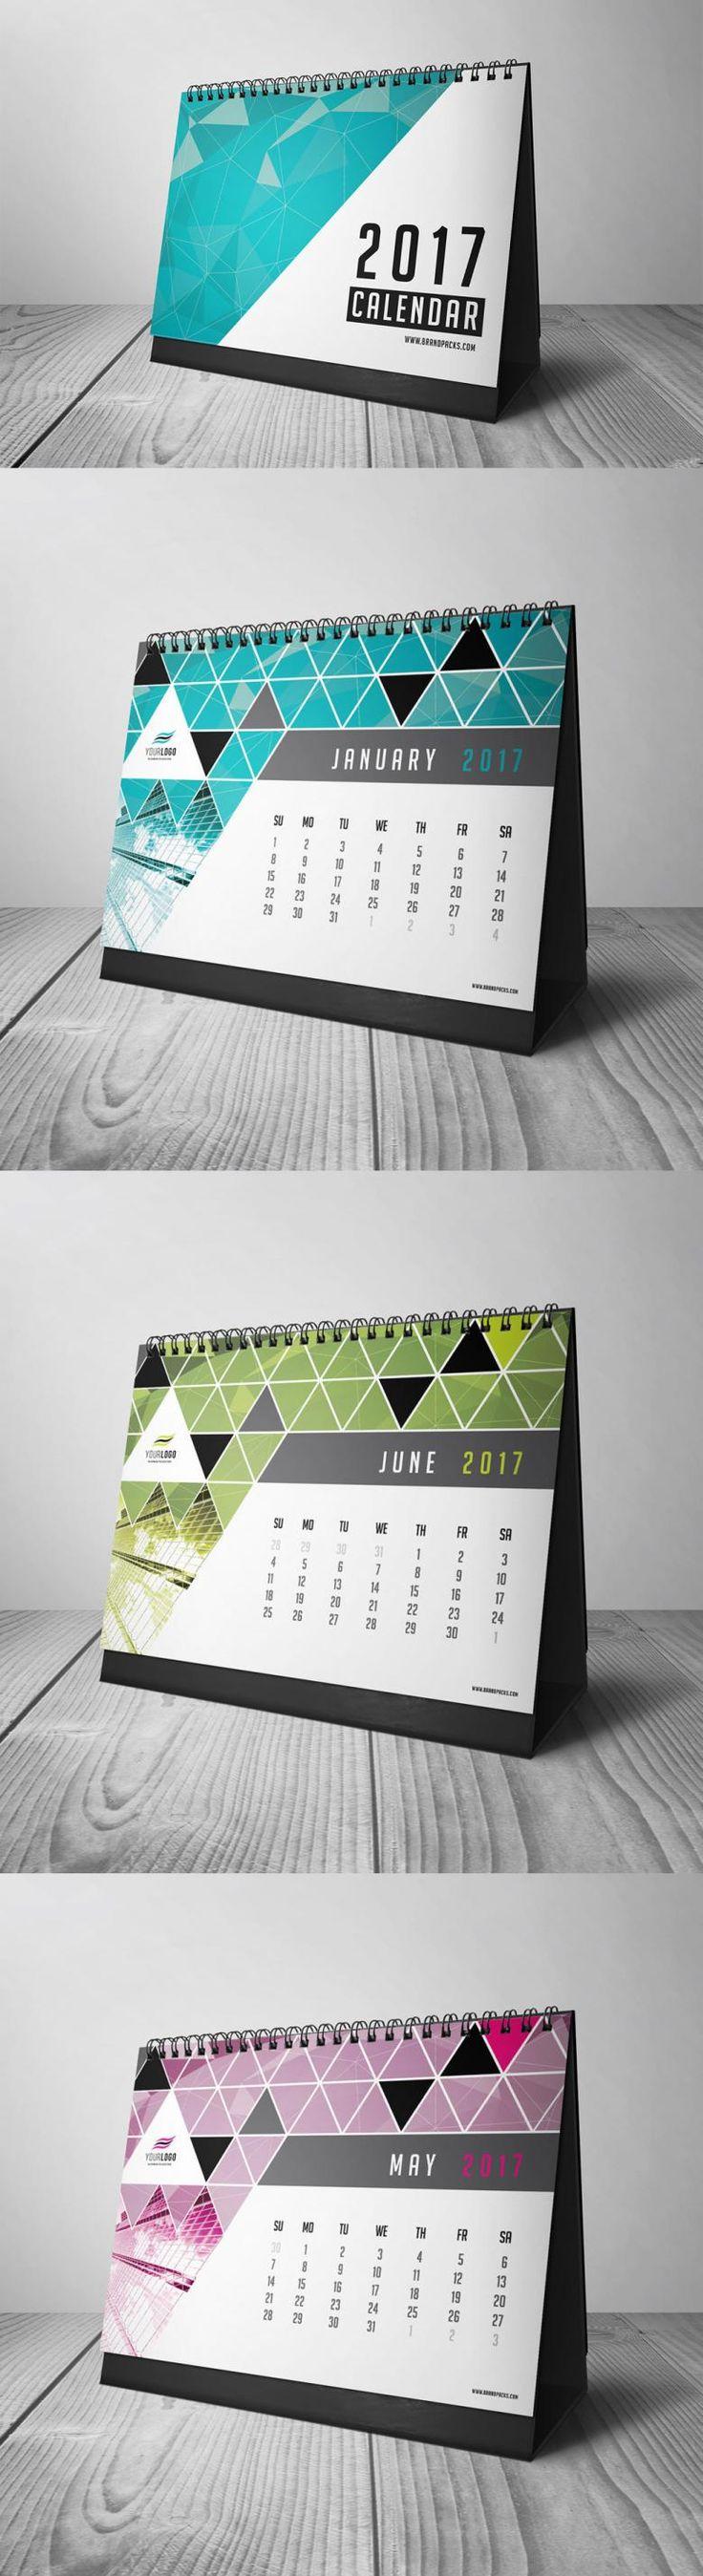 Free 2017 Calendar Print Template